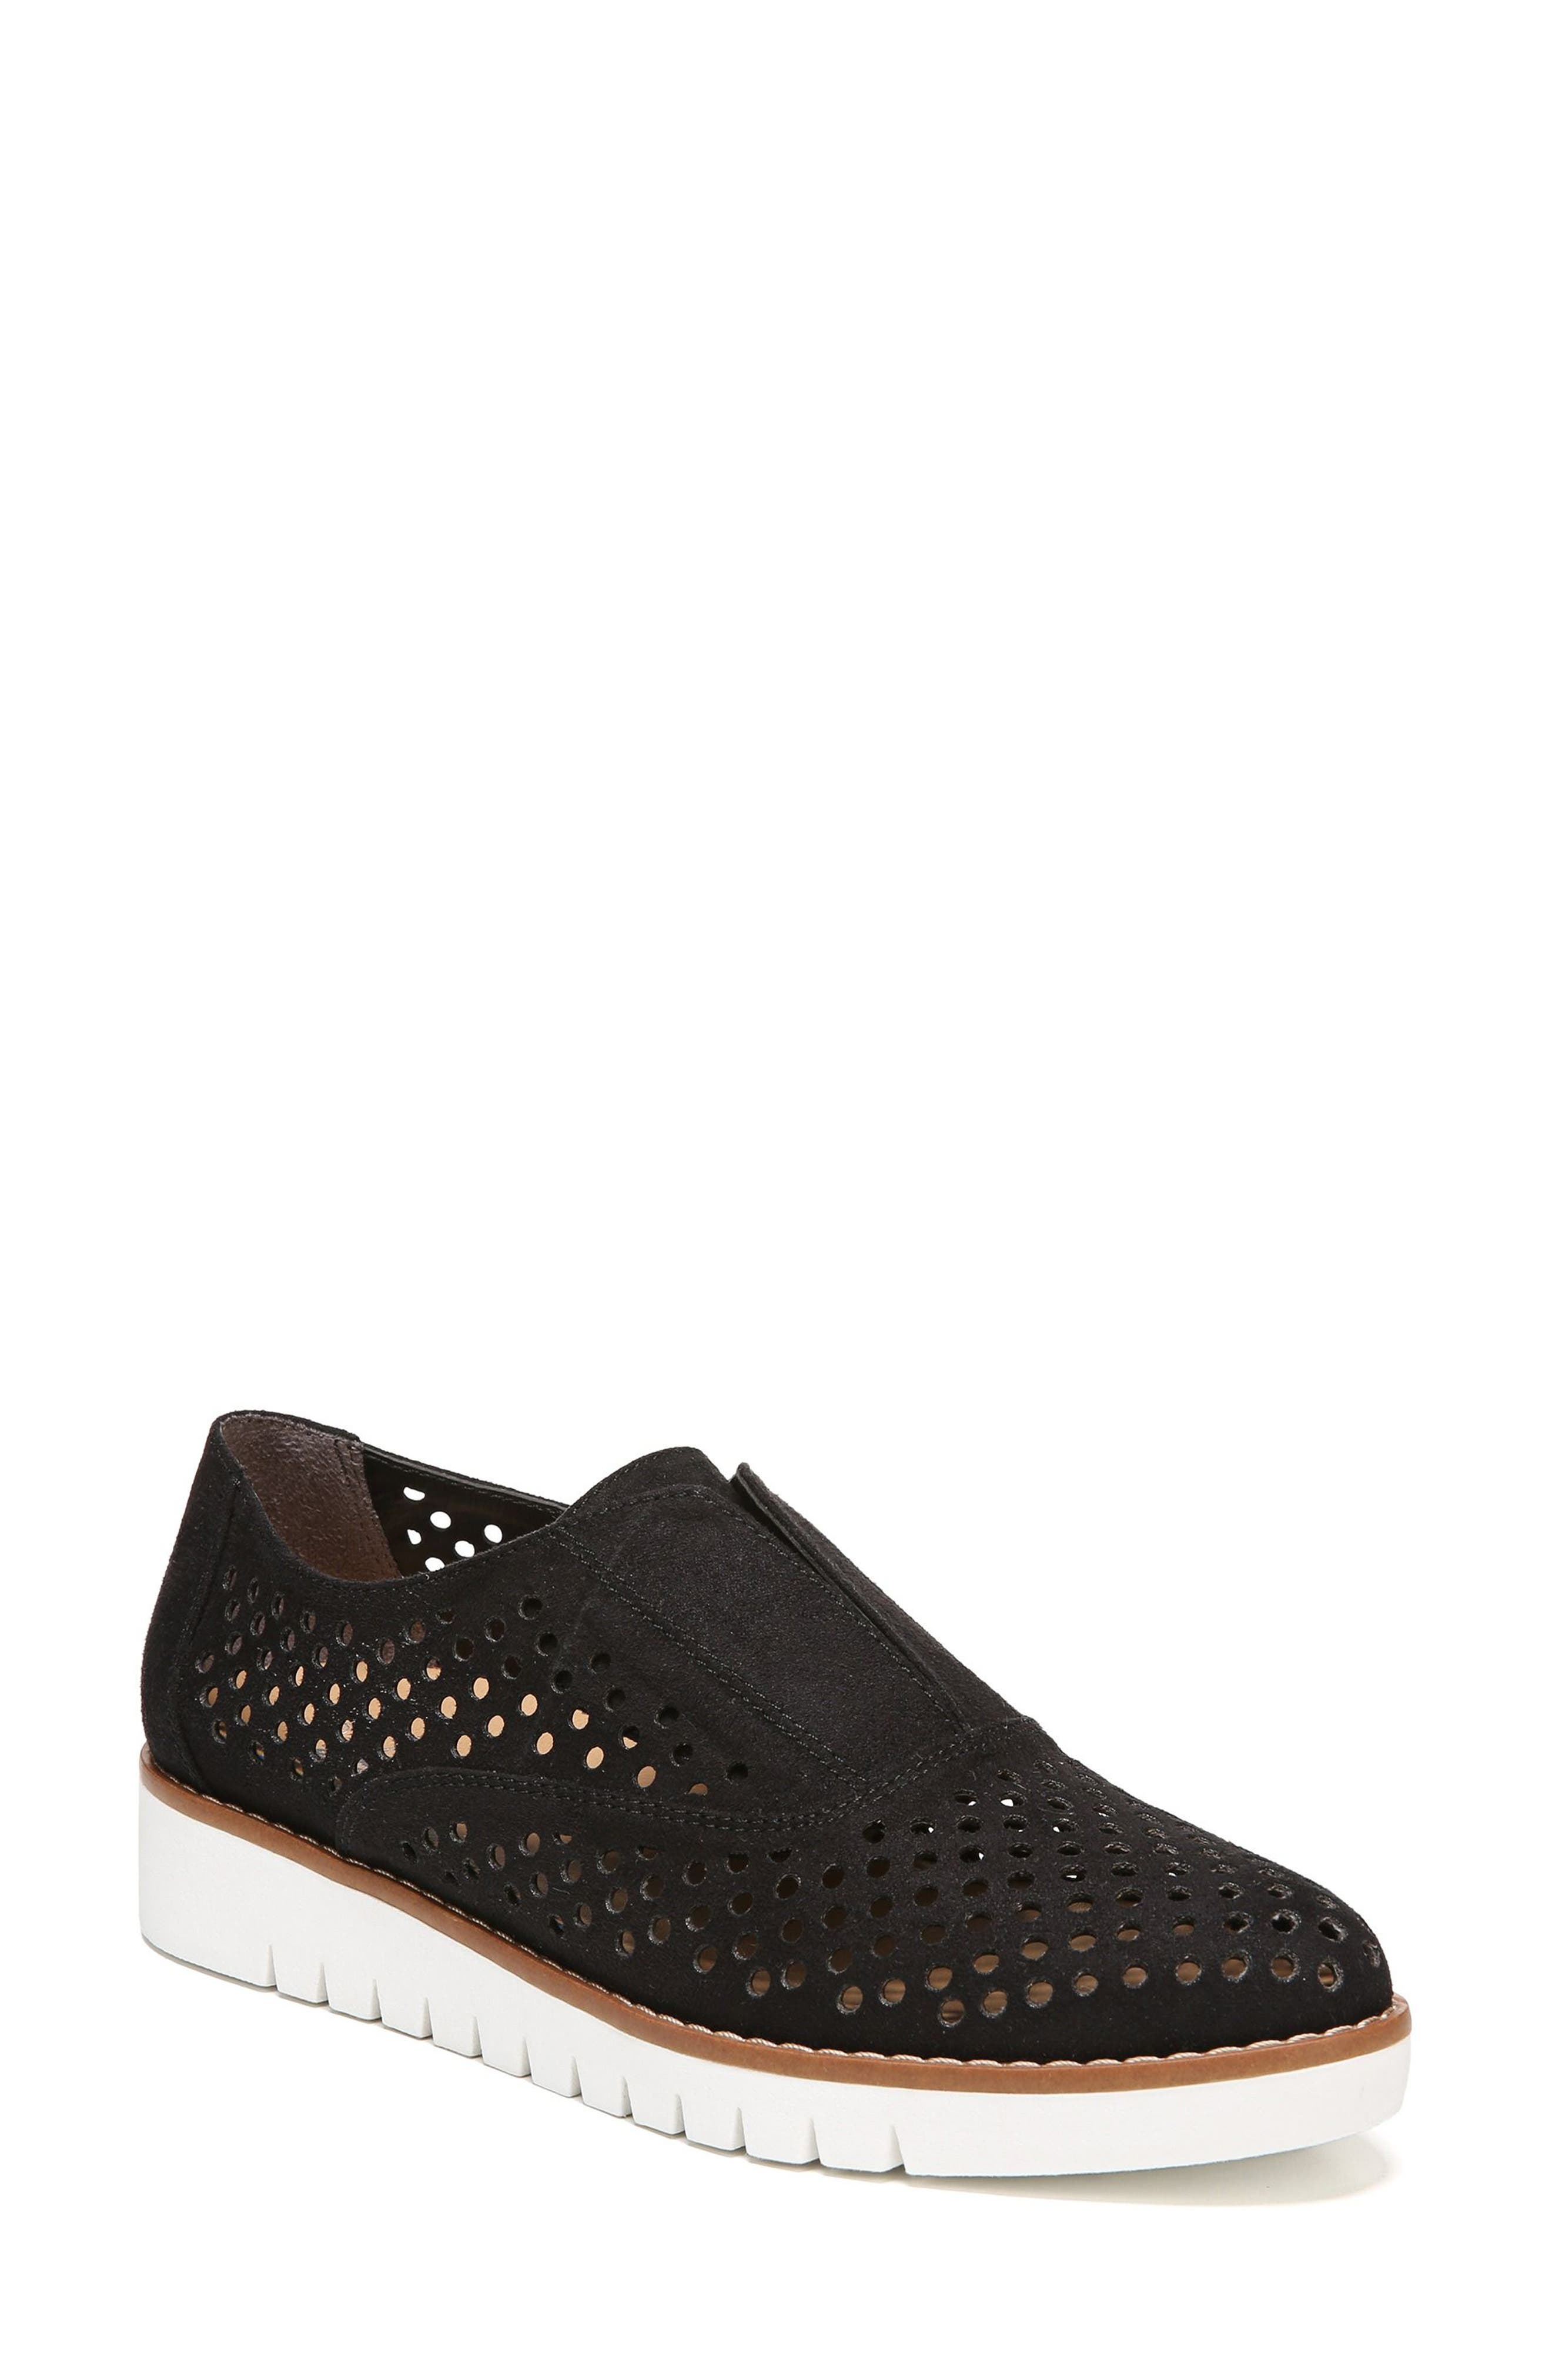 Improve Slip-On Sneaker,                         Main,                         color, Black Fabric